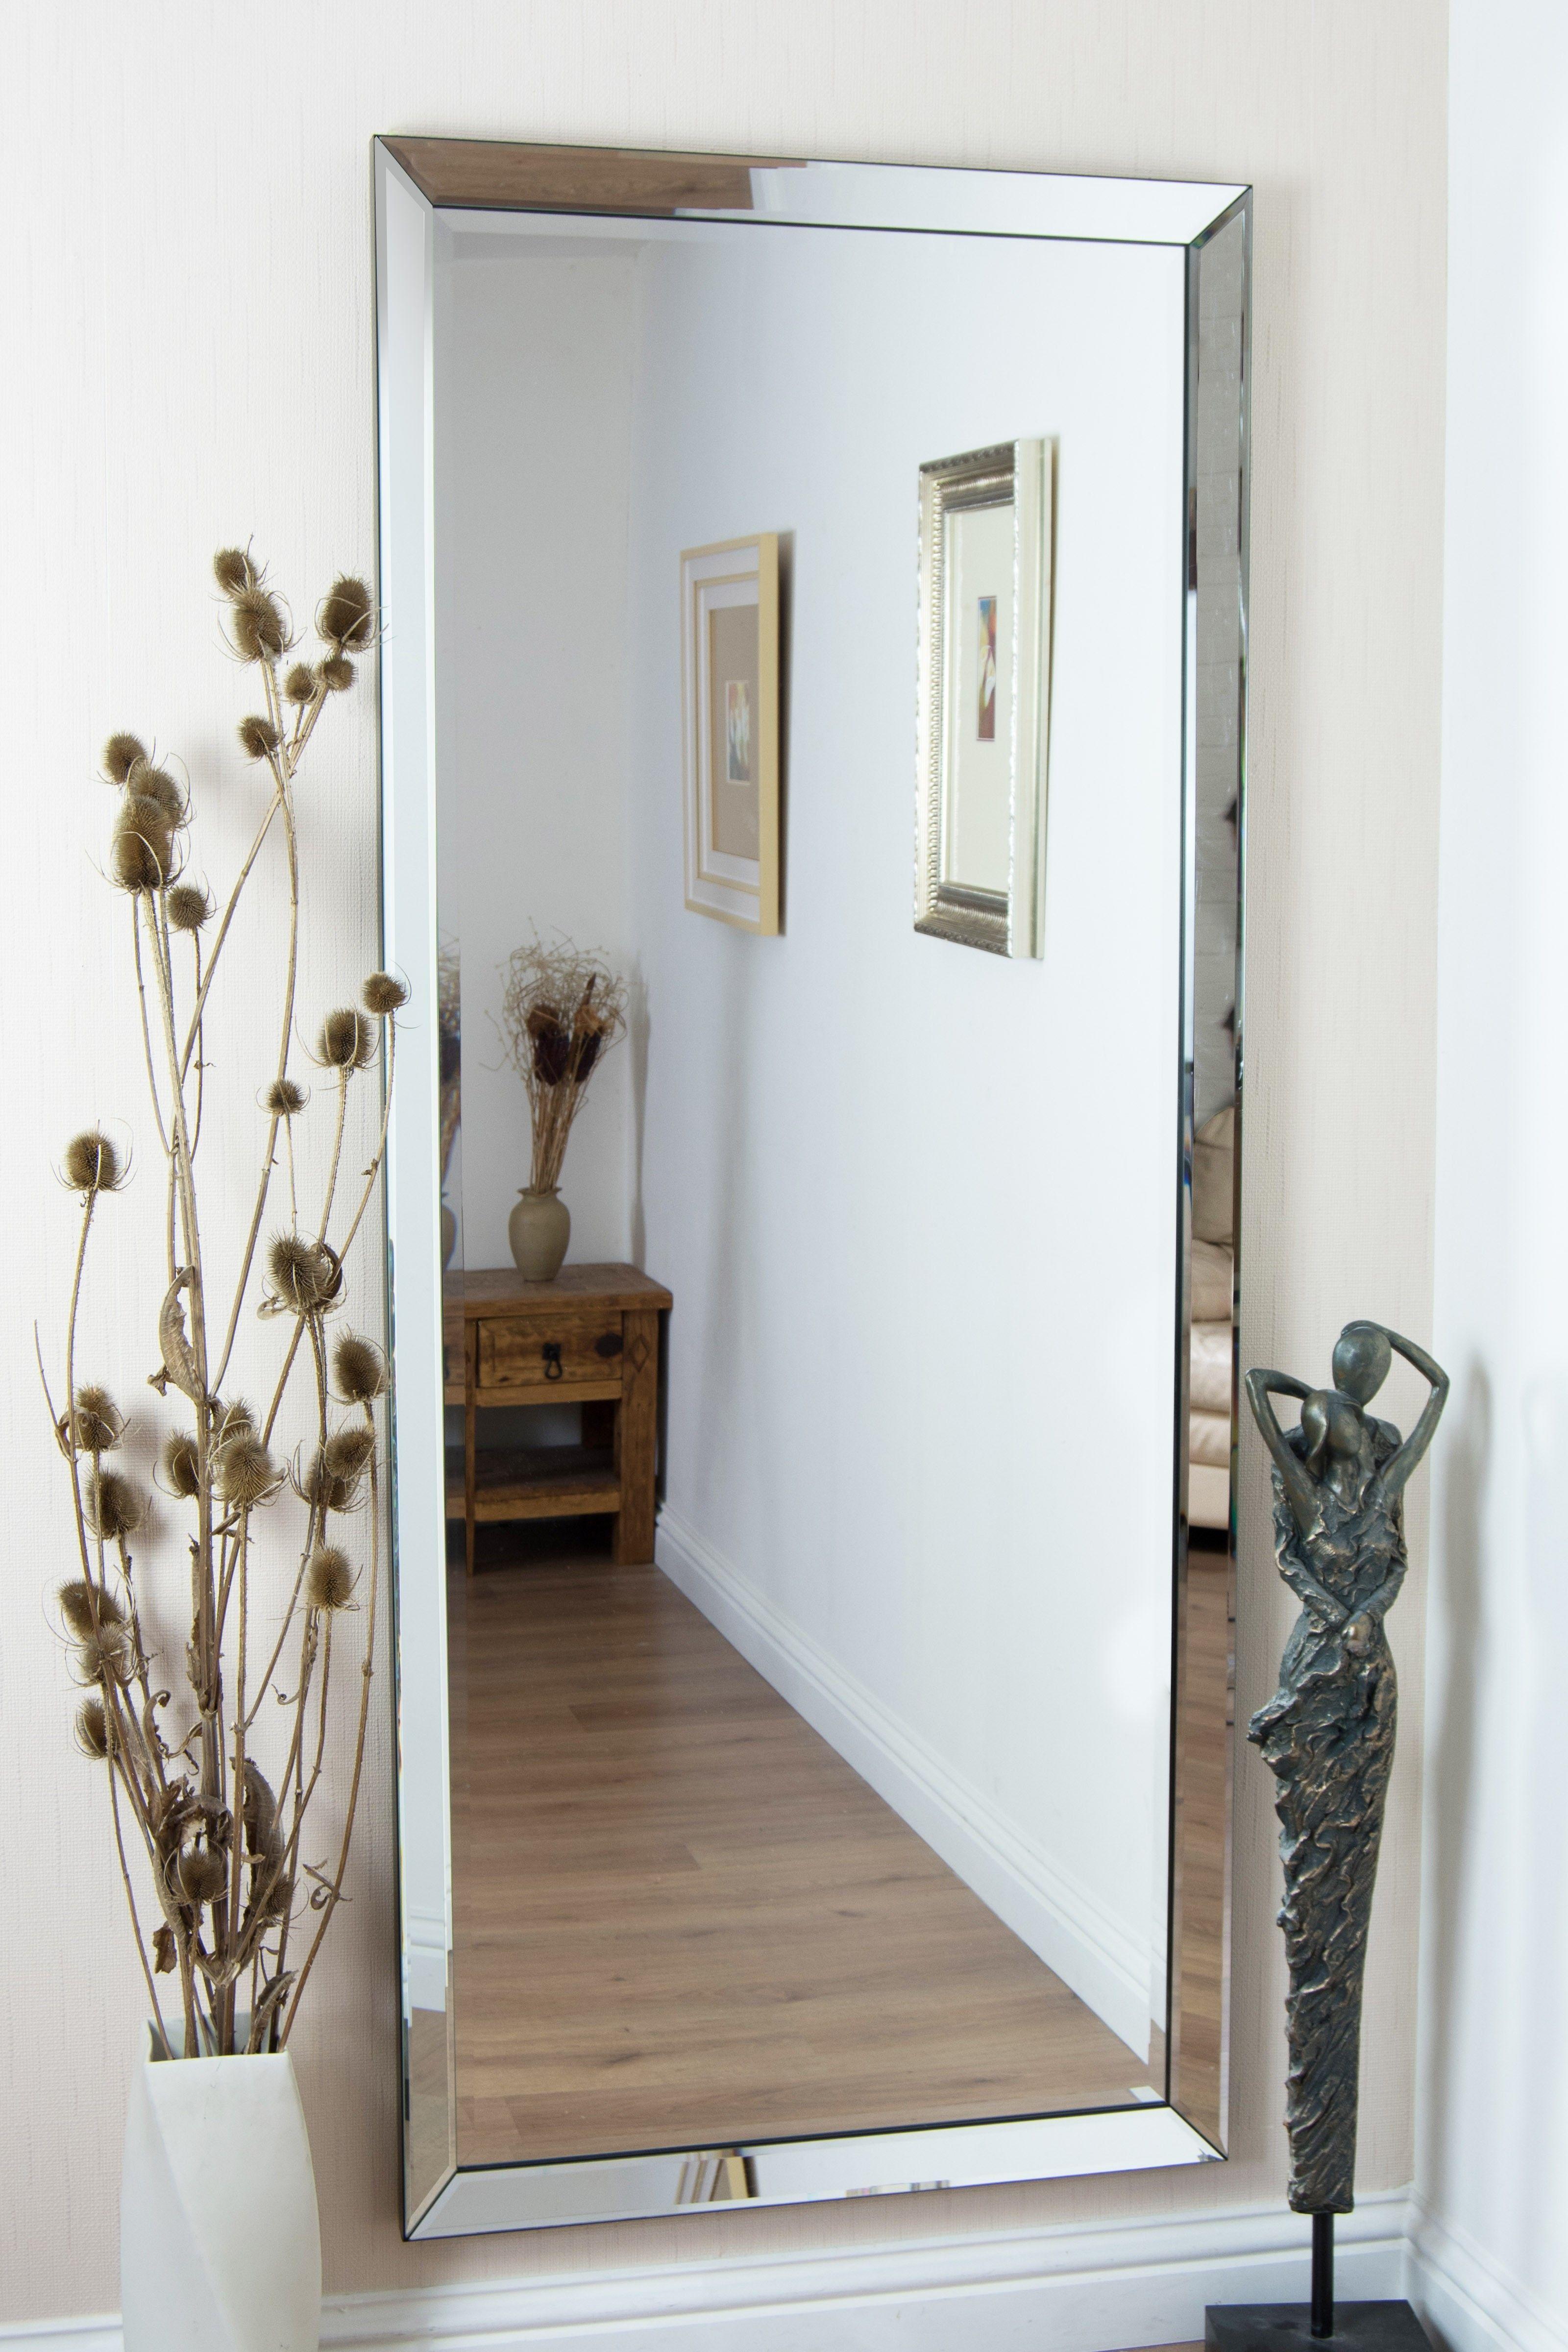 Large Rectangular Mirrors For Walls Mirror Wall Bedroom Modern Mirror Wall Big Wall Mirrors